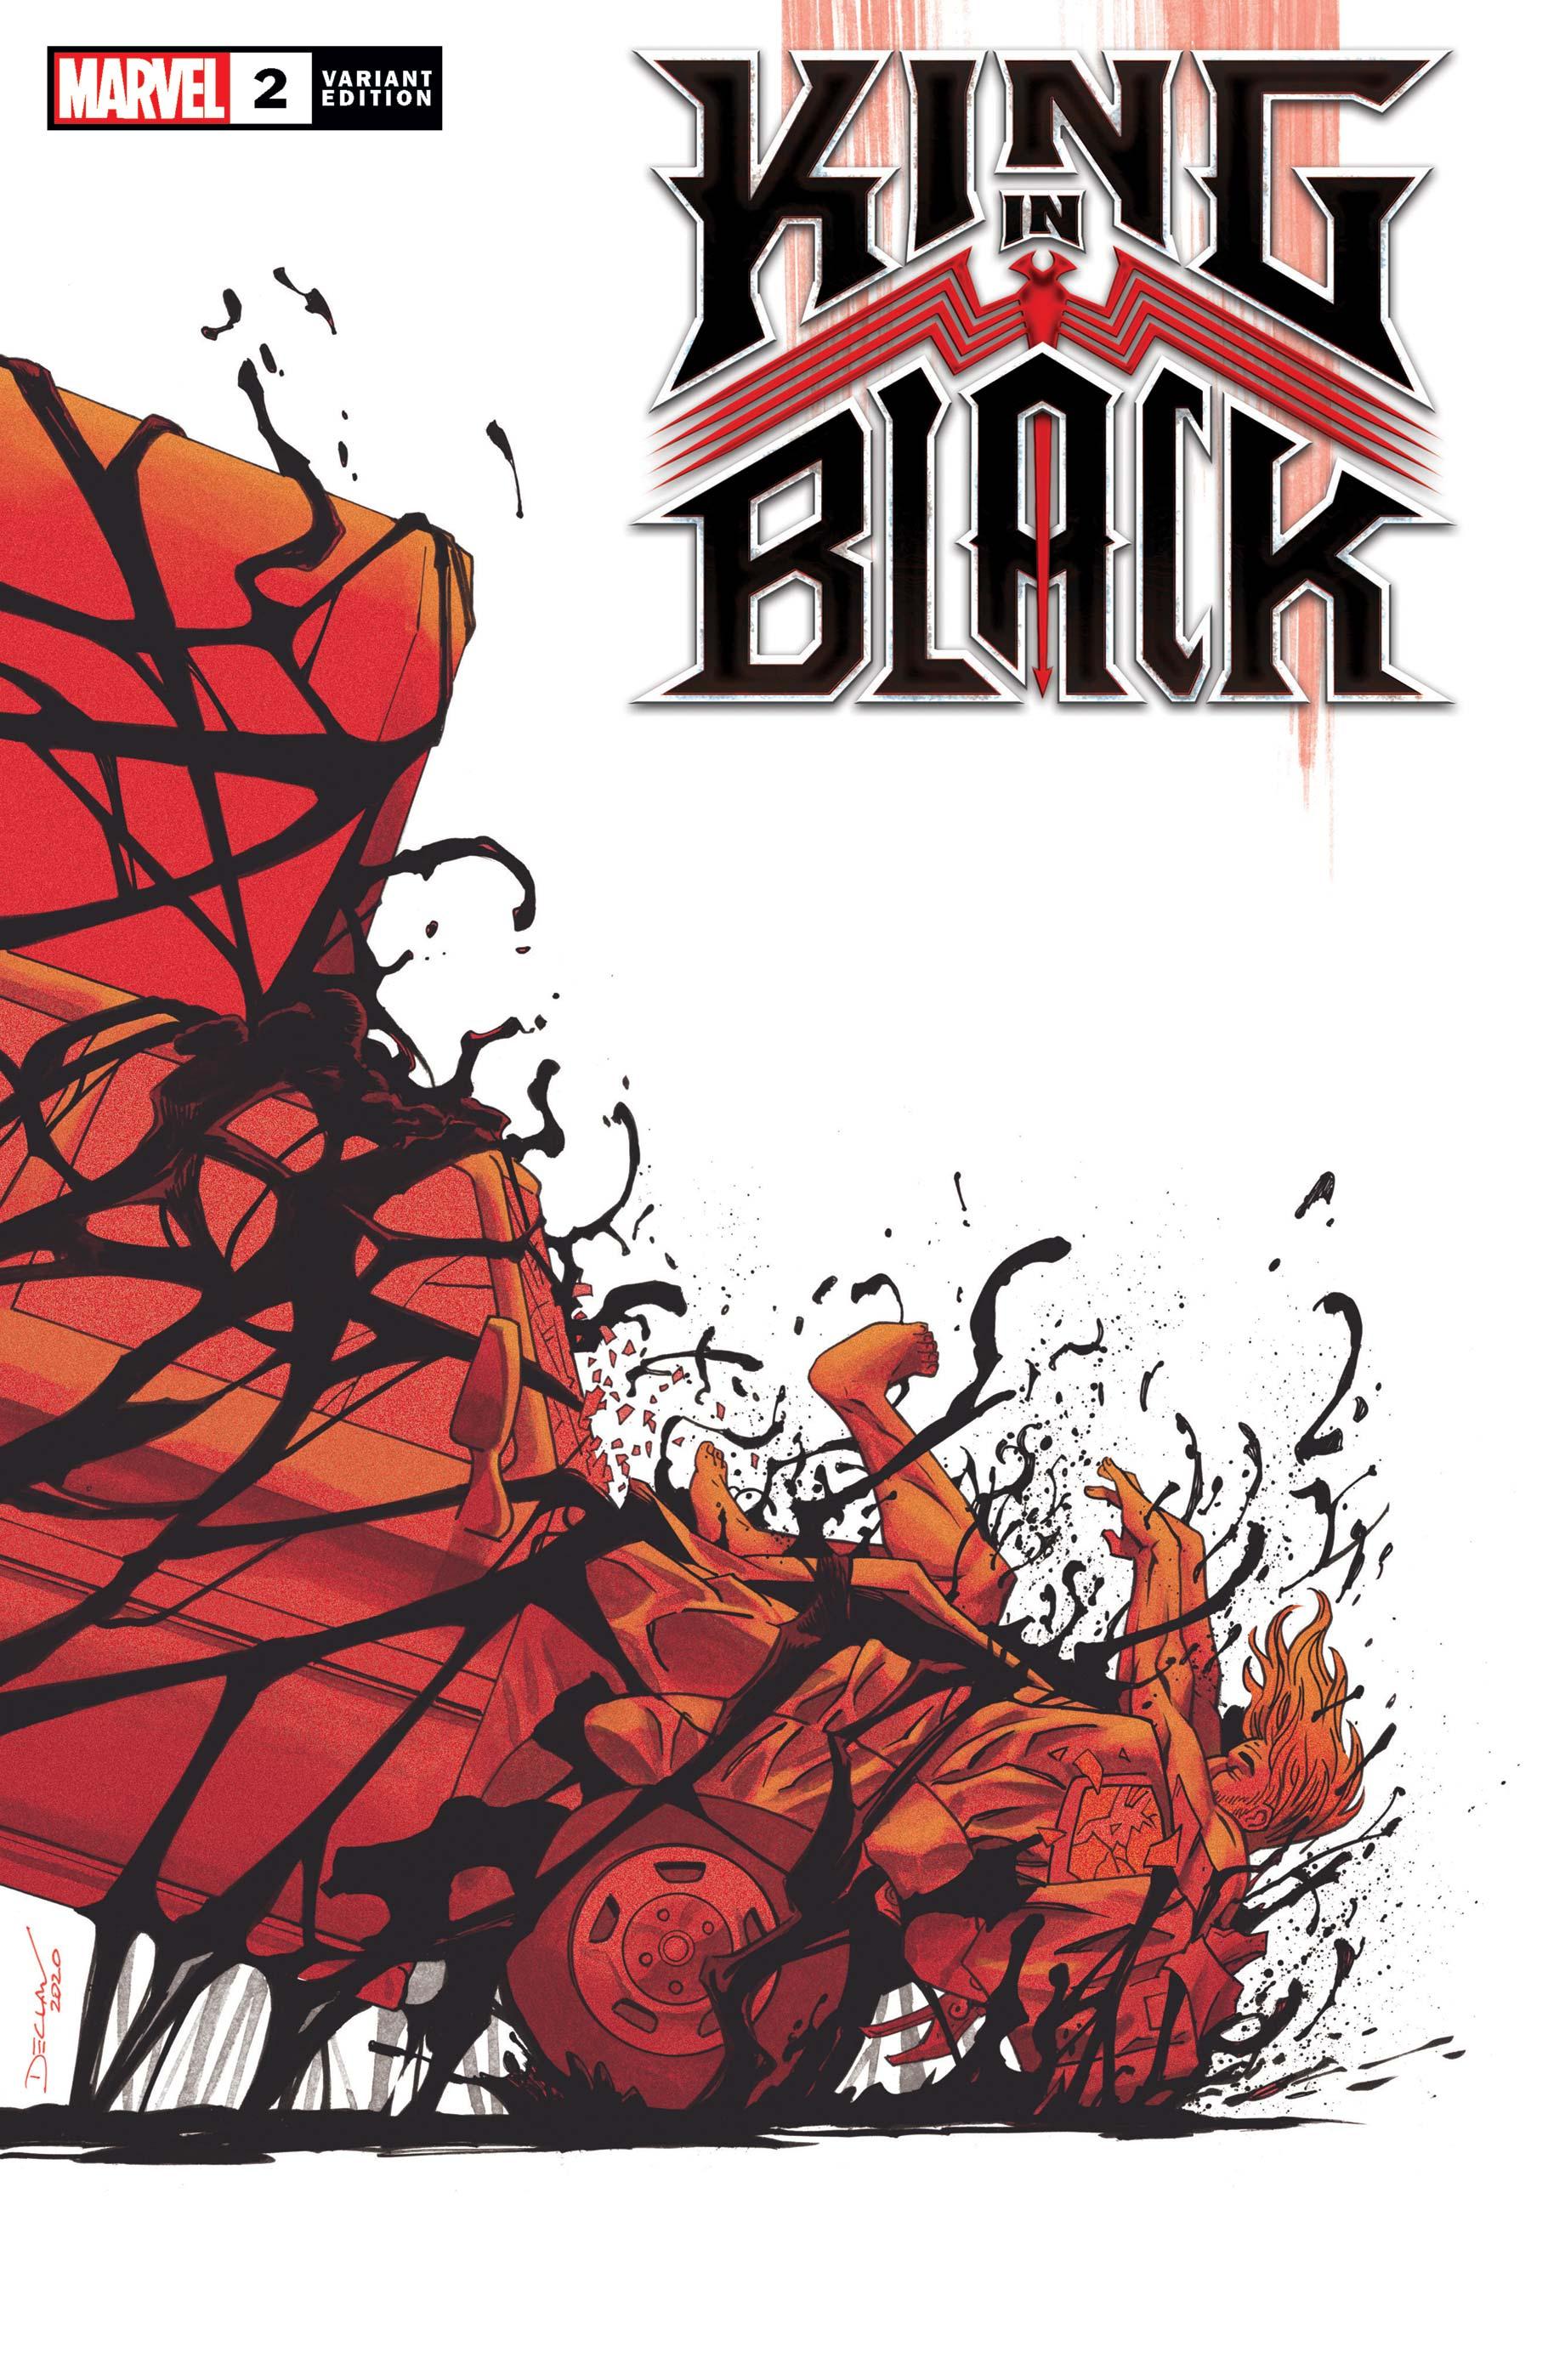 King in Black (2020) #2 (Variant)